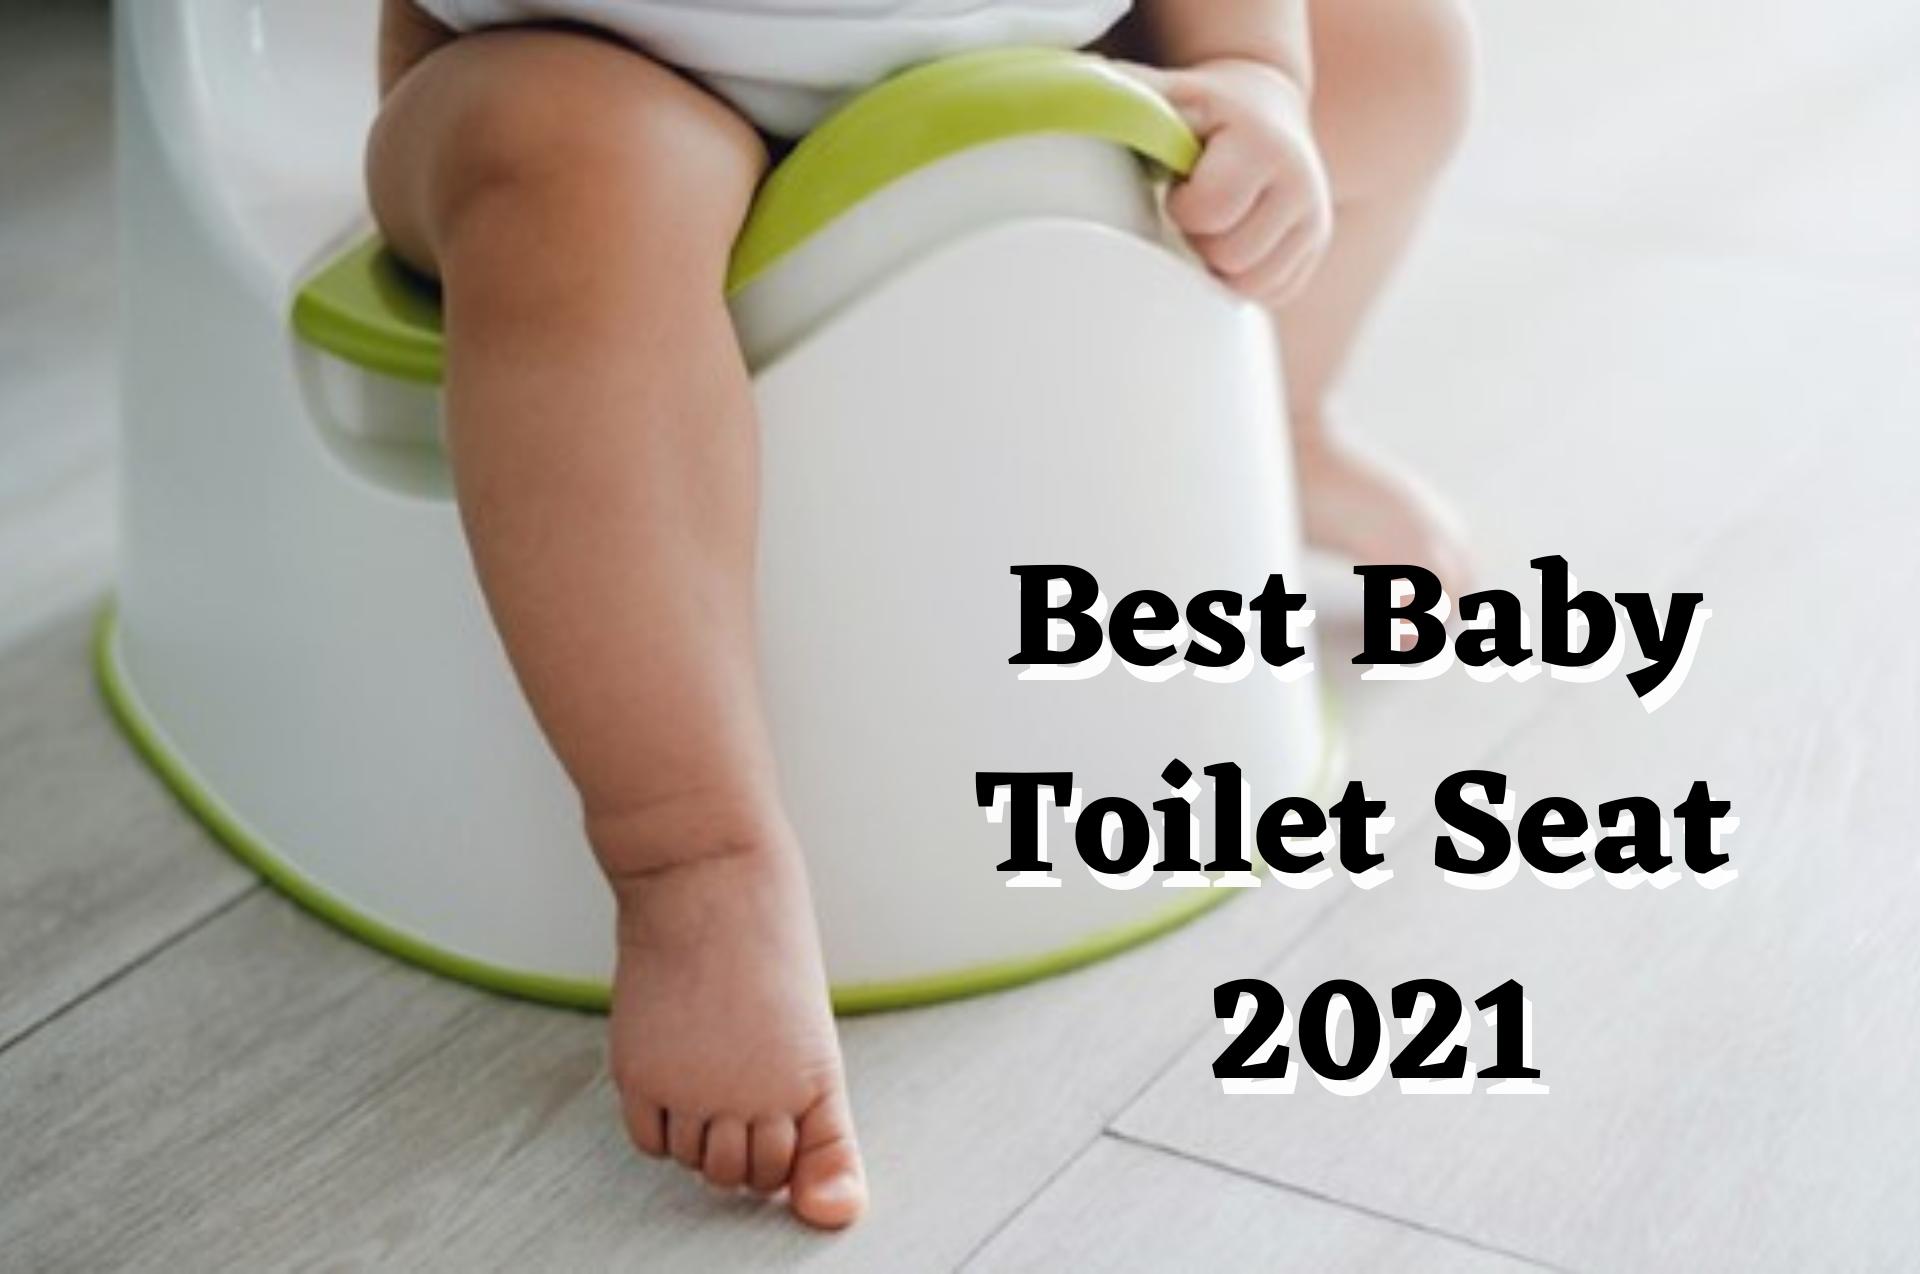 Best Baby Toilet Seat 2021